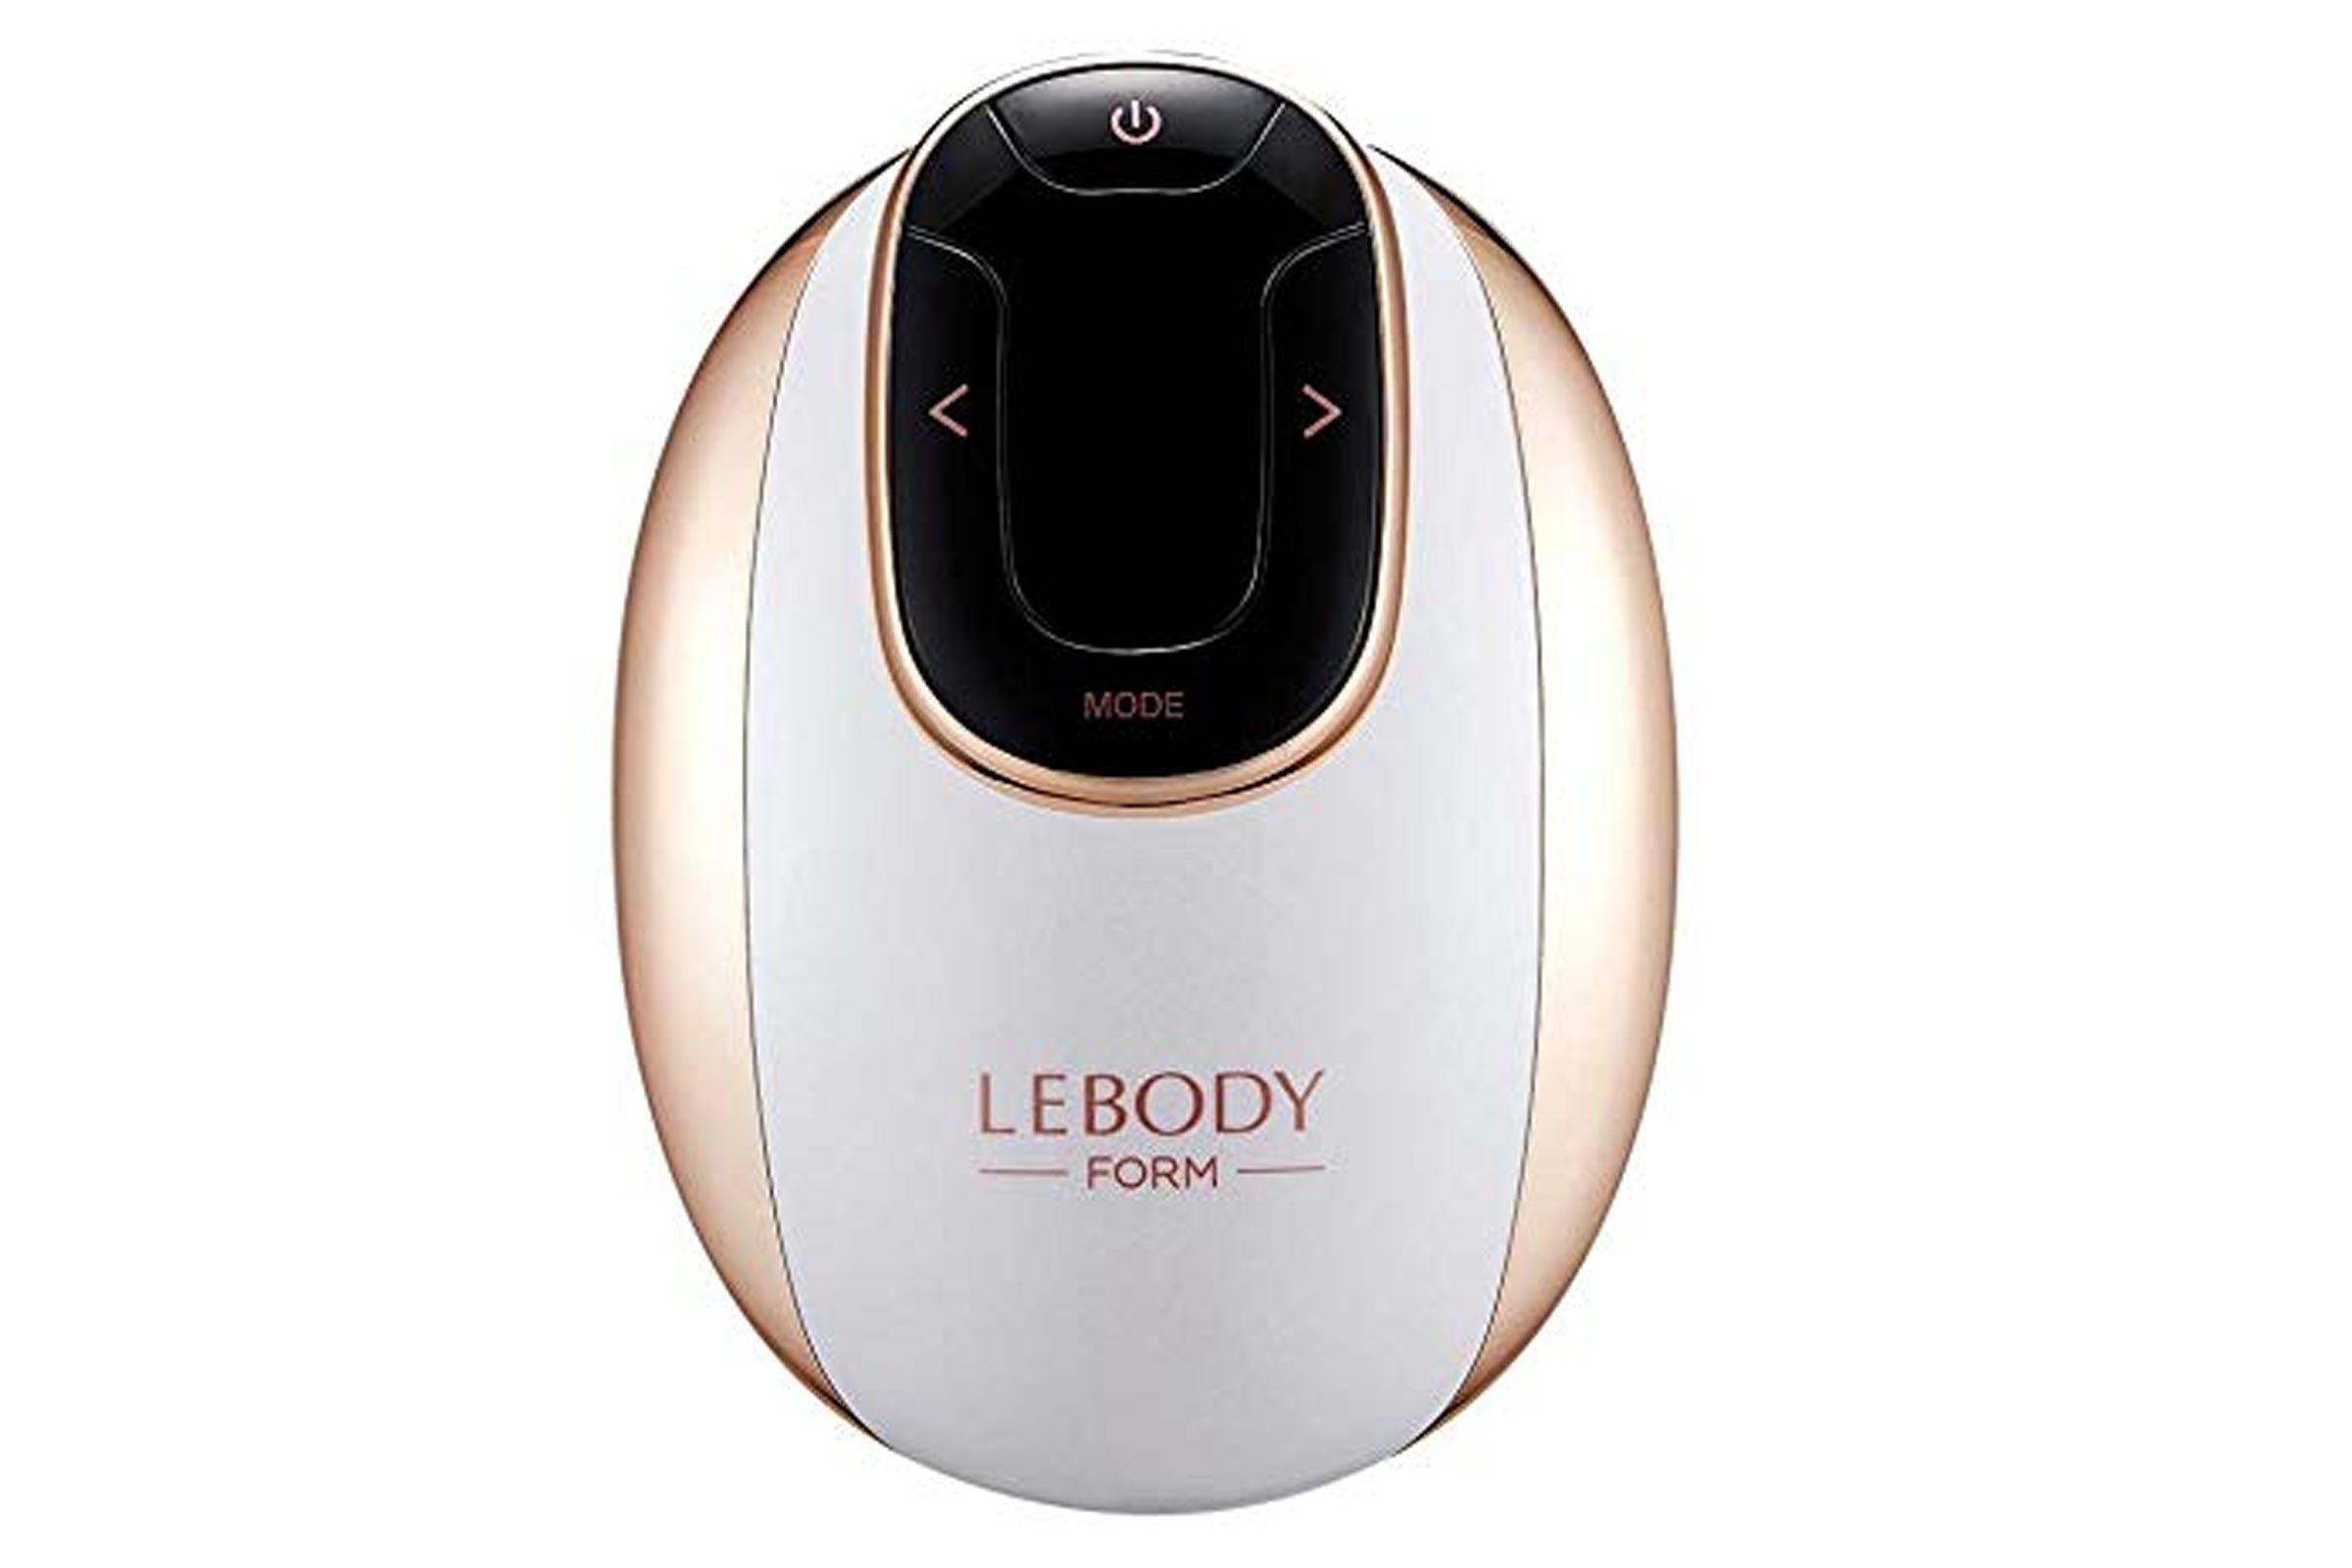 LEBODY Form White Body Massager + Massage Cream 3ea + Waist Belt + Arm Band Set